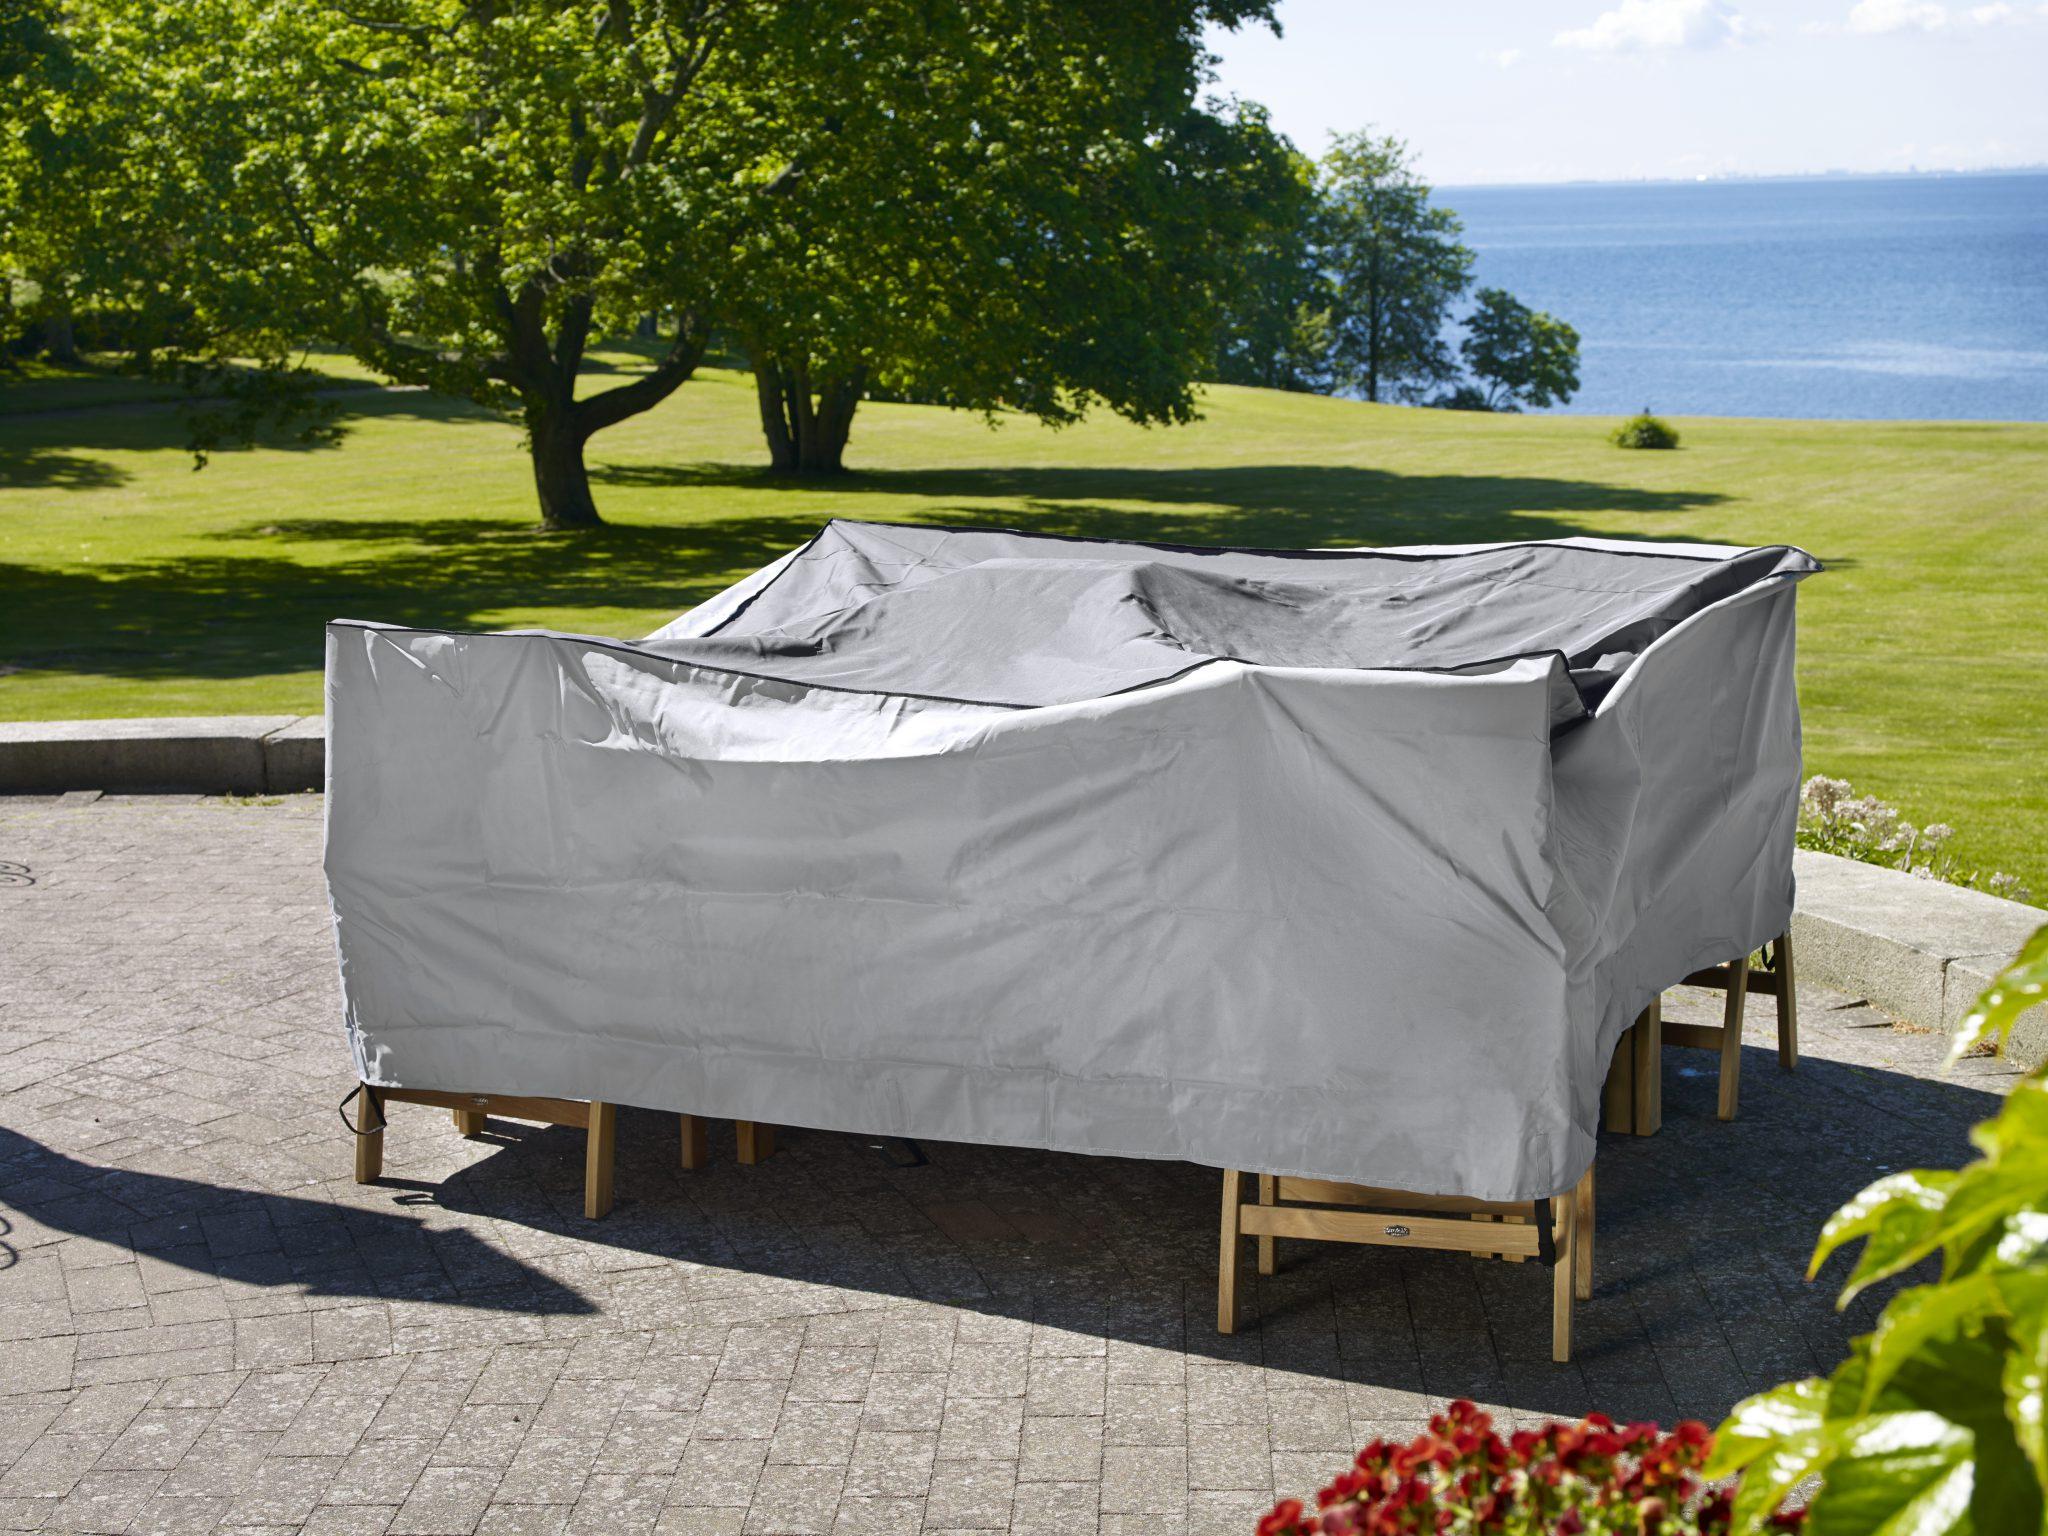 Lauko baldų uždangalas (220x220 cm)